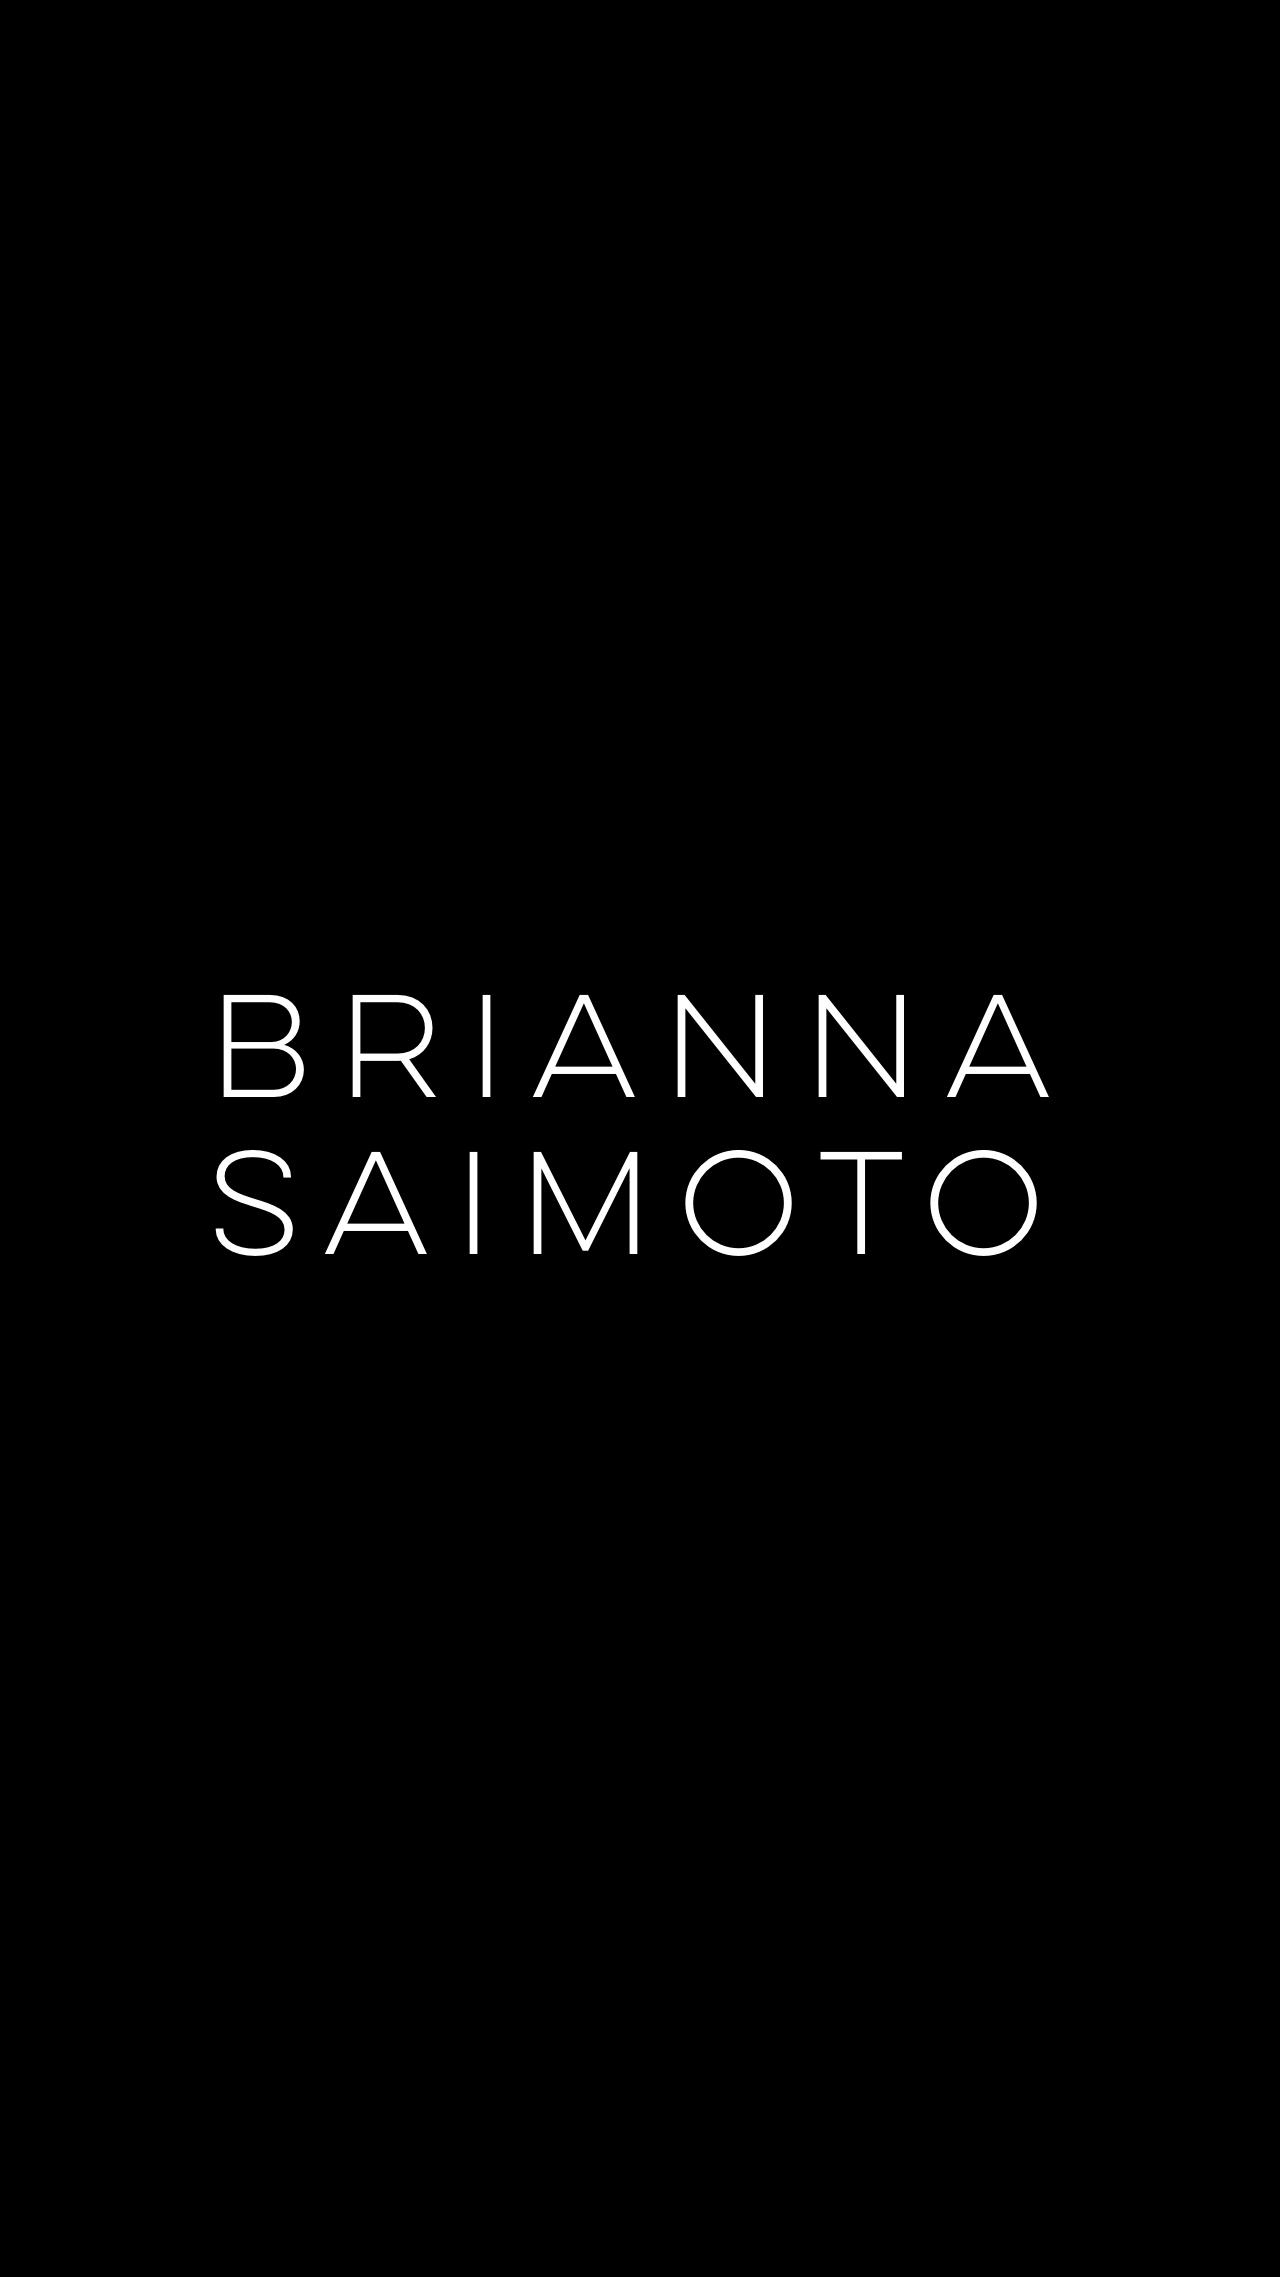 BRIANNA SAIMOTO (2).jpg